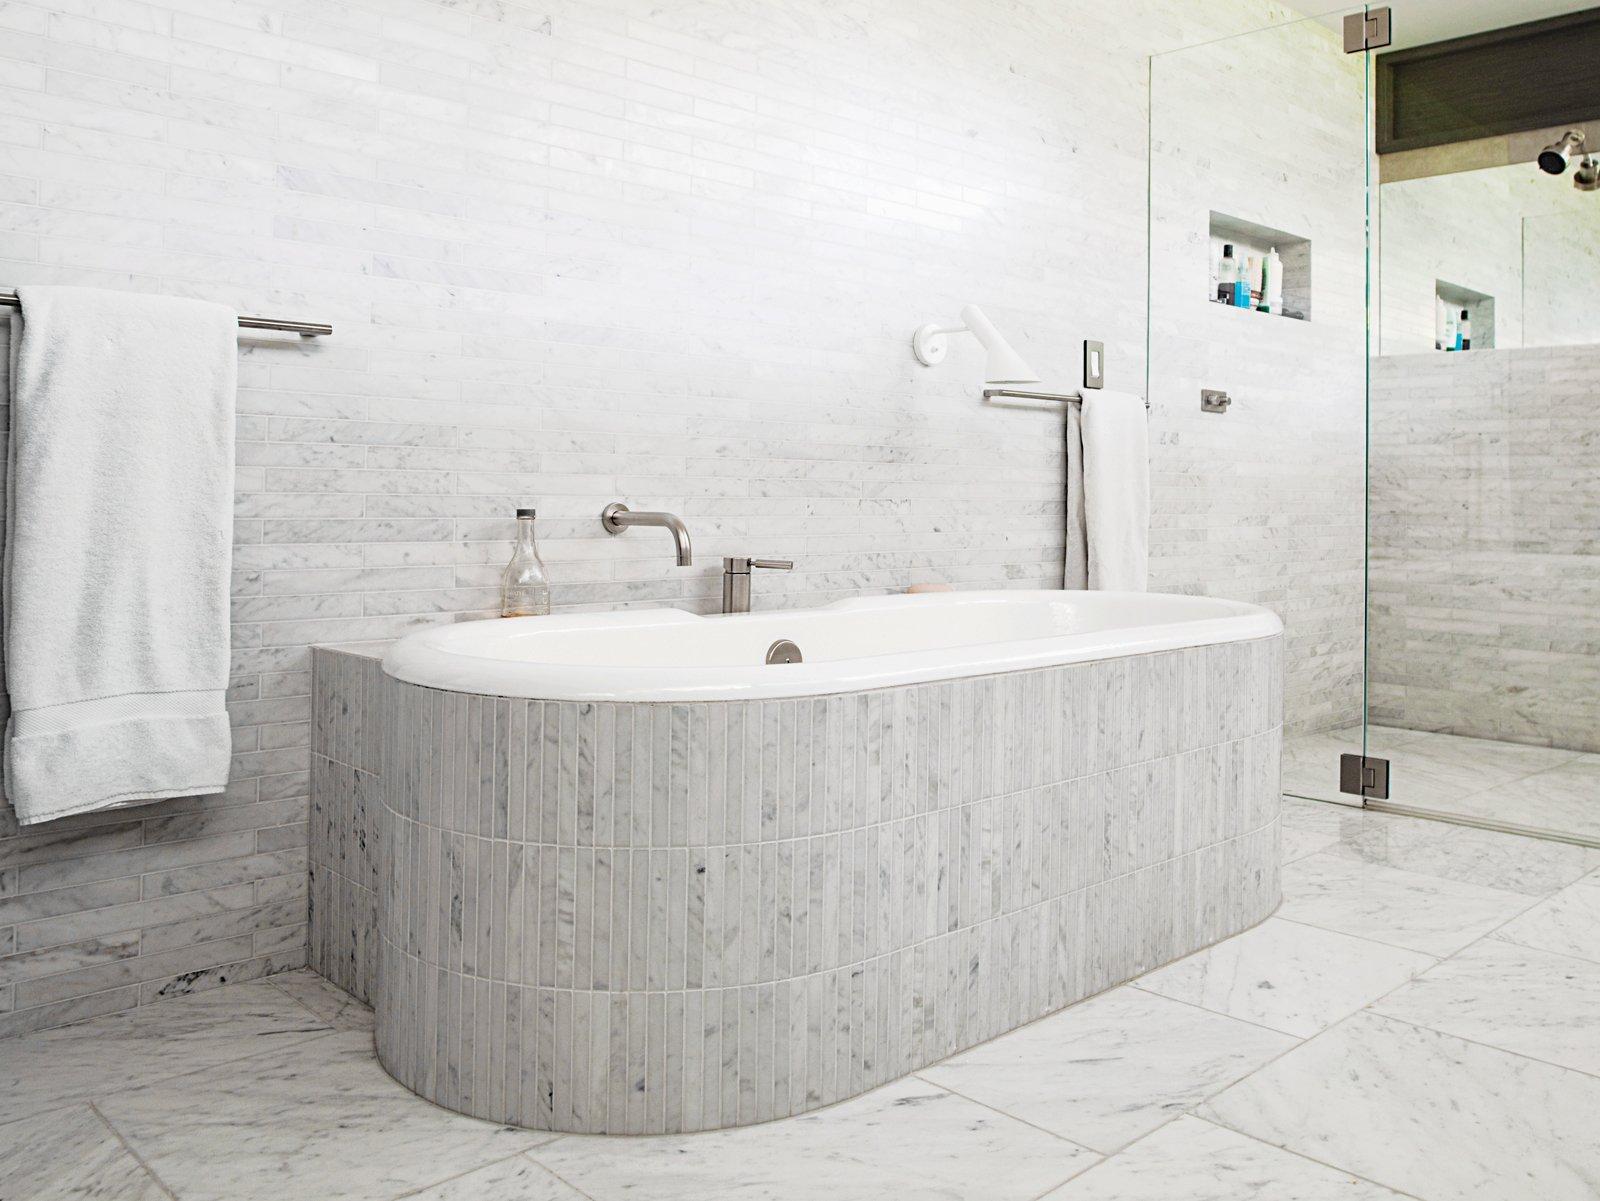 Carrara Marble Tiles Bathroom on glass tile bathroom, beige travertine tile bathroom, revere pewter benjamin moore subway tile bathroom, bisque tile bathroom, ivory tile bathroom, oak tile bathroom, bone tile bathroom, white marble bathroom, rustic barn door bathroom, industrial design house bathroom, crema marfil tile bathroom, green marble tile bathroom, biscuit tile bathroom, stone tile bathroom, limestone tile bathroom, emperador marble bathroom, graphite tile bathroom, alabaster tile bathroom, stainless steel tile bathroom, crystal tile bathroom,